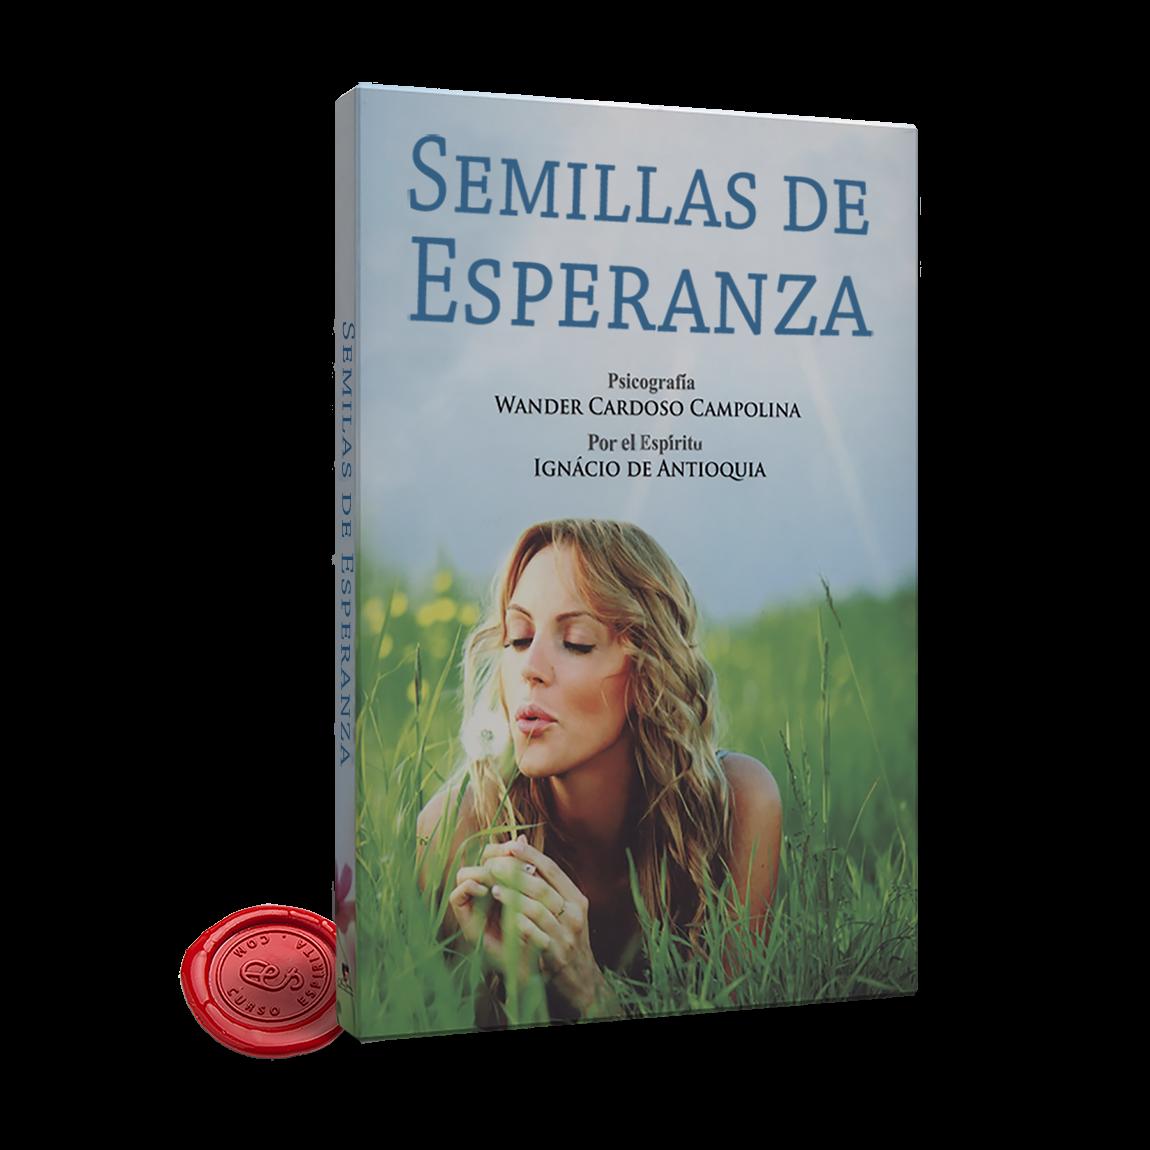 Portada libro Semillas de Esperanza